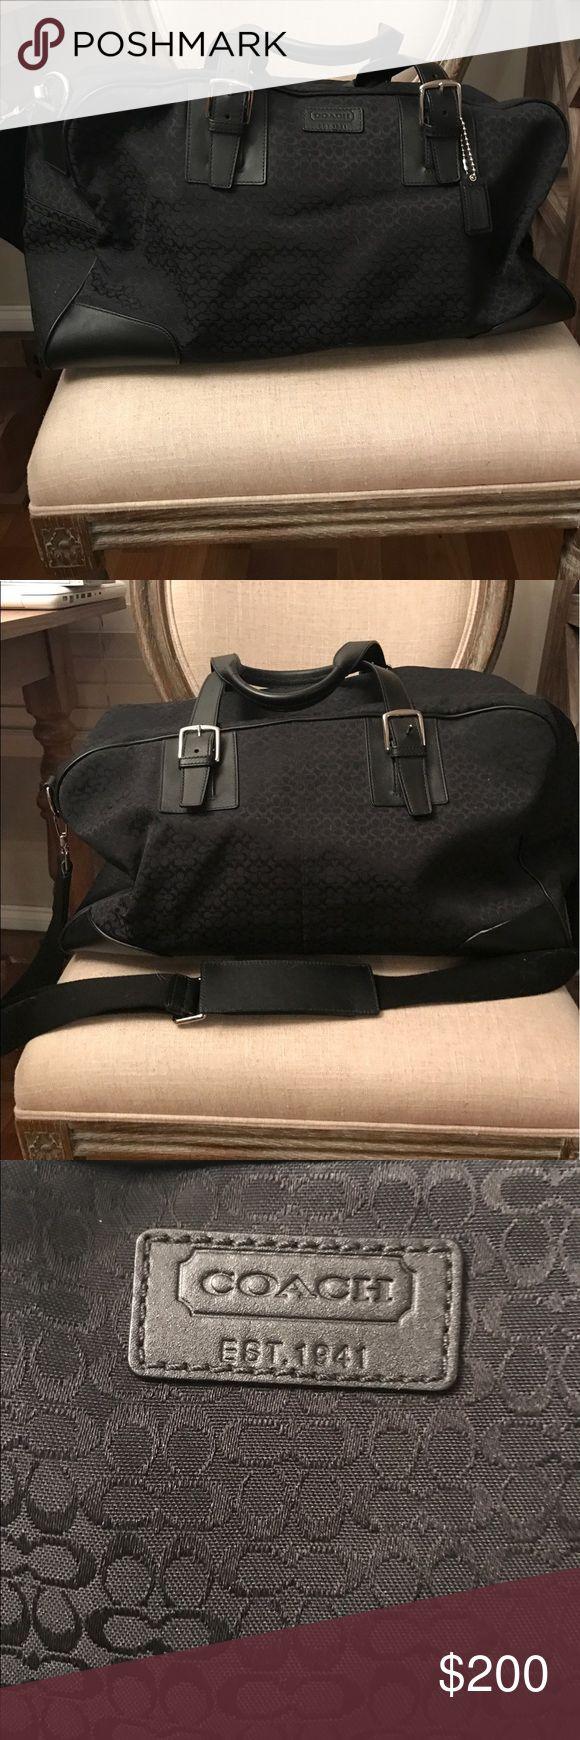 coach luggage outlet eags  Coach duffle bag